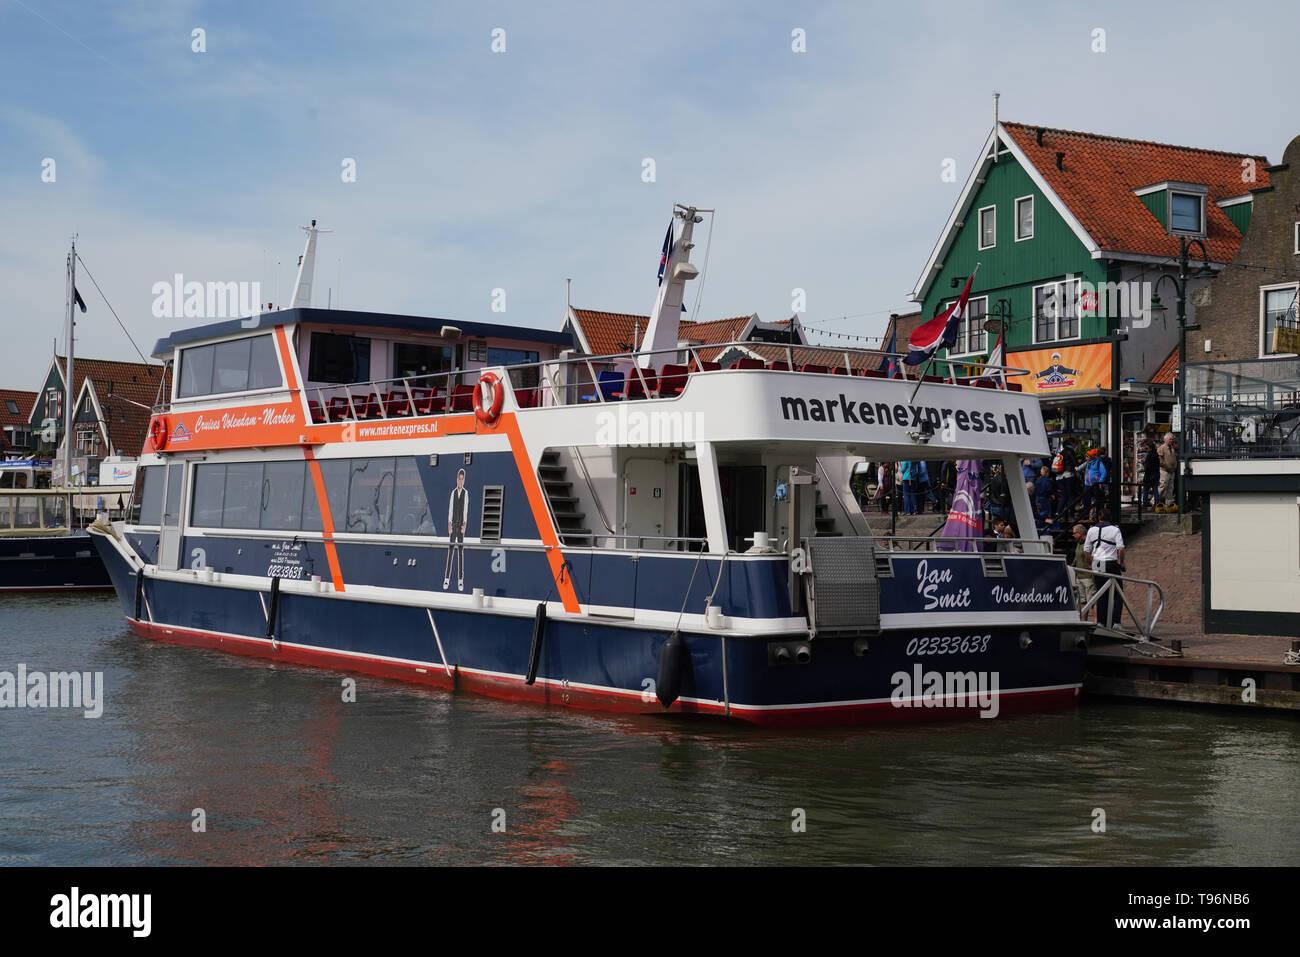 Marken Express ferry to Voleddam - Stock Image